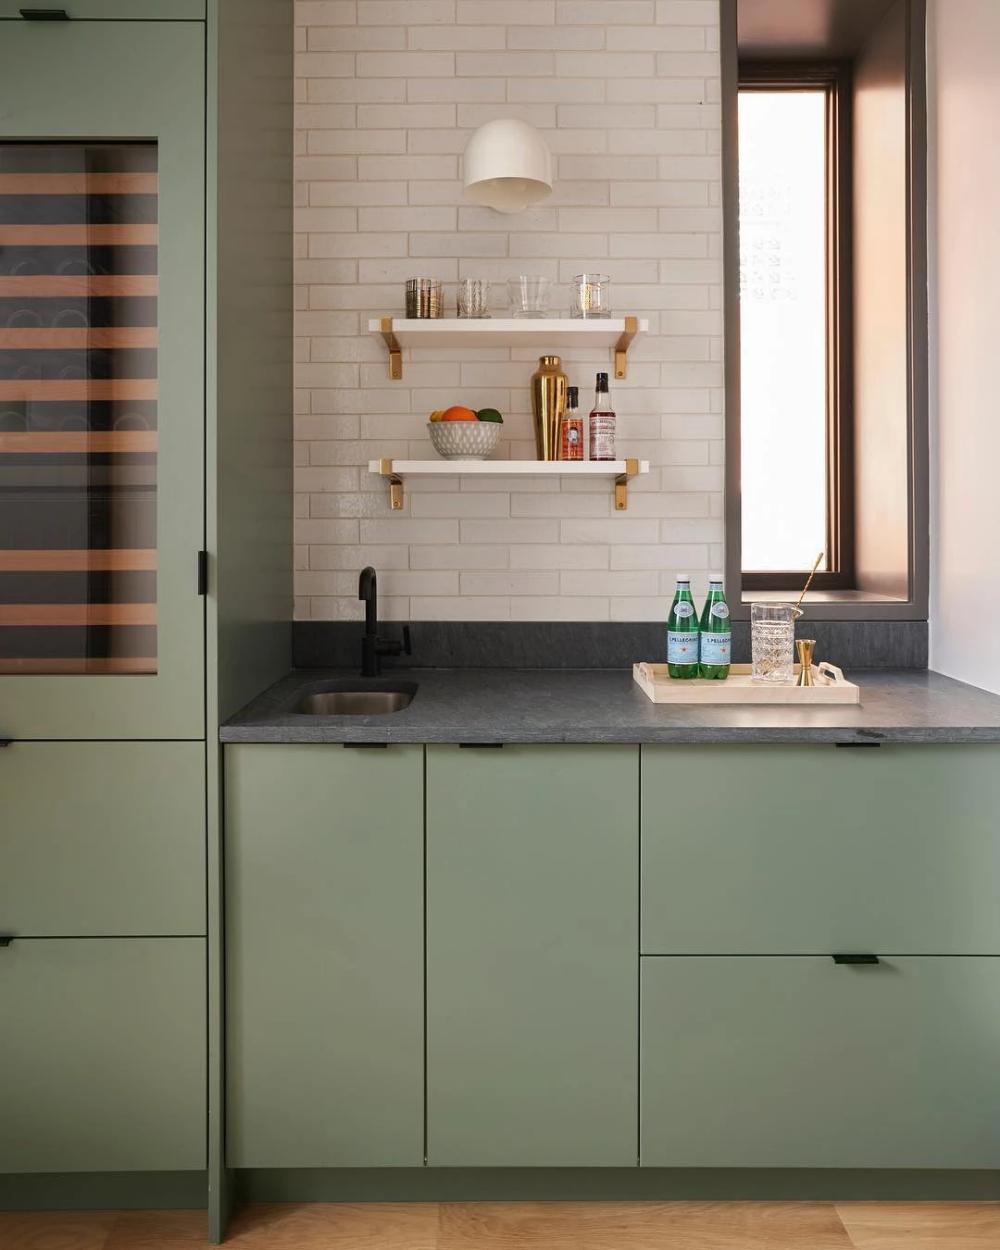 Contemporary Chicago Kitchen For The Modern Family In 2020 Ikea Kitchen Design Kitchen Interior Green Kitchen Cabinets